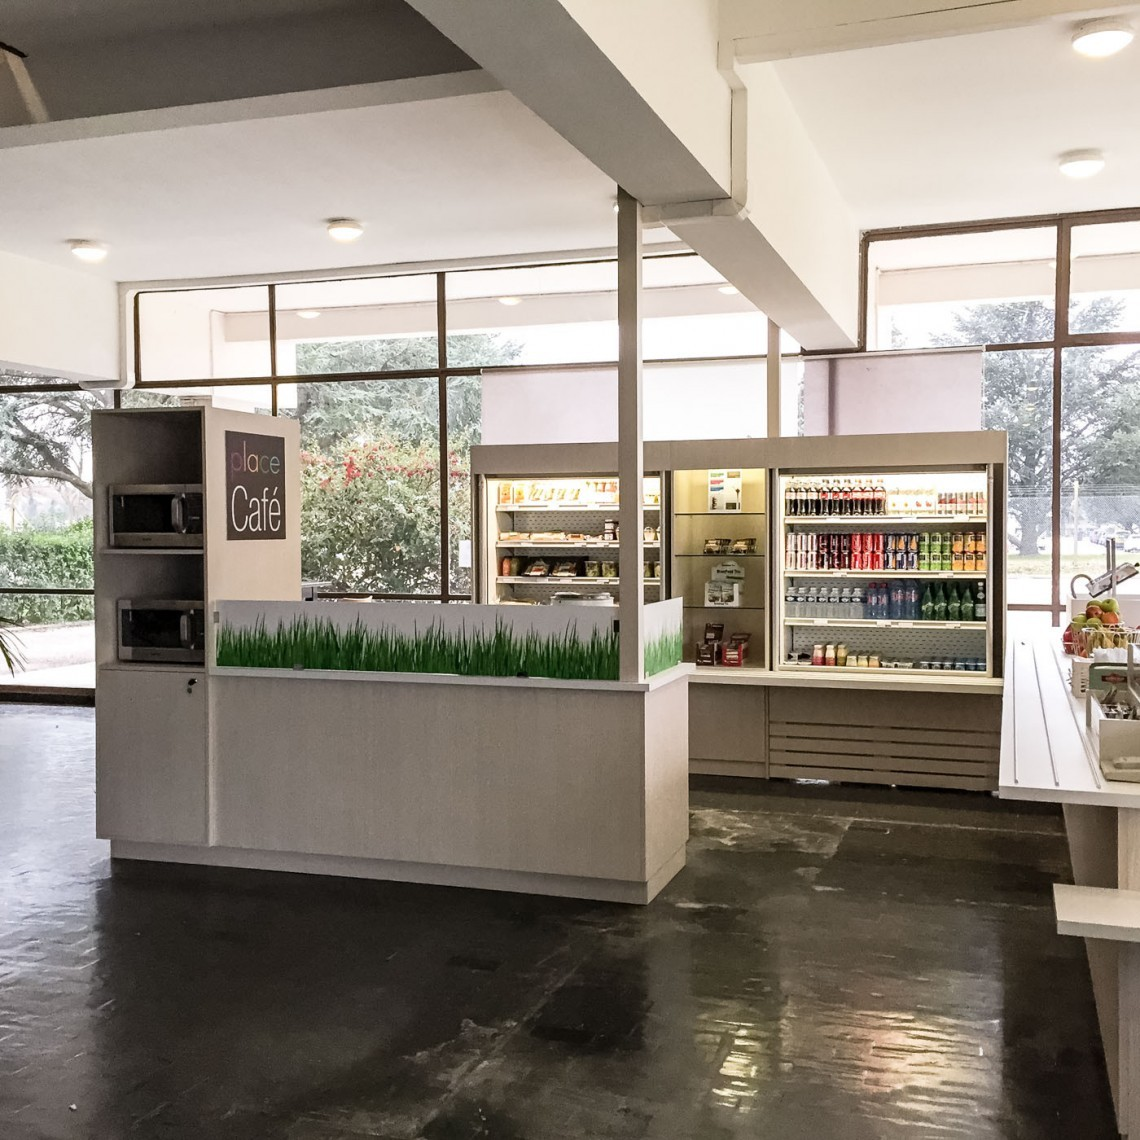 Meuble design lyon mobilier haut de gamme cuisine luxe for Meuble cuisine haut de gamme